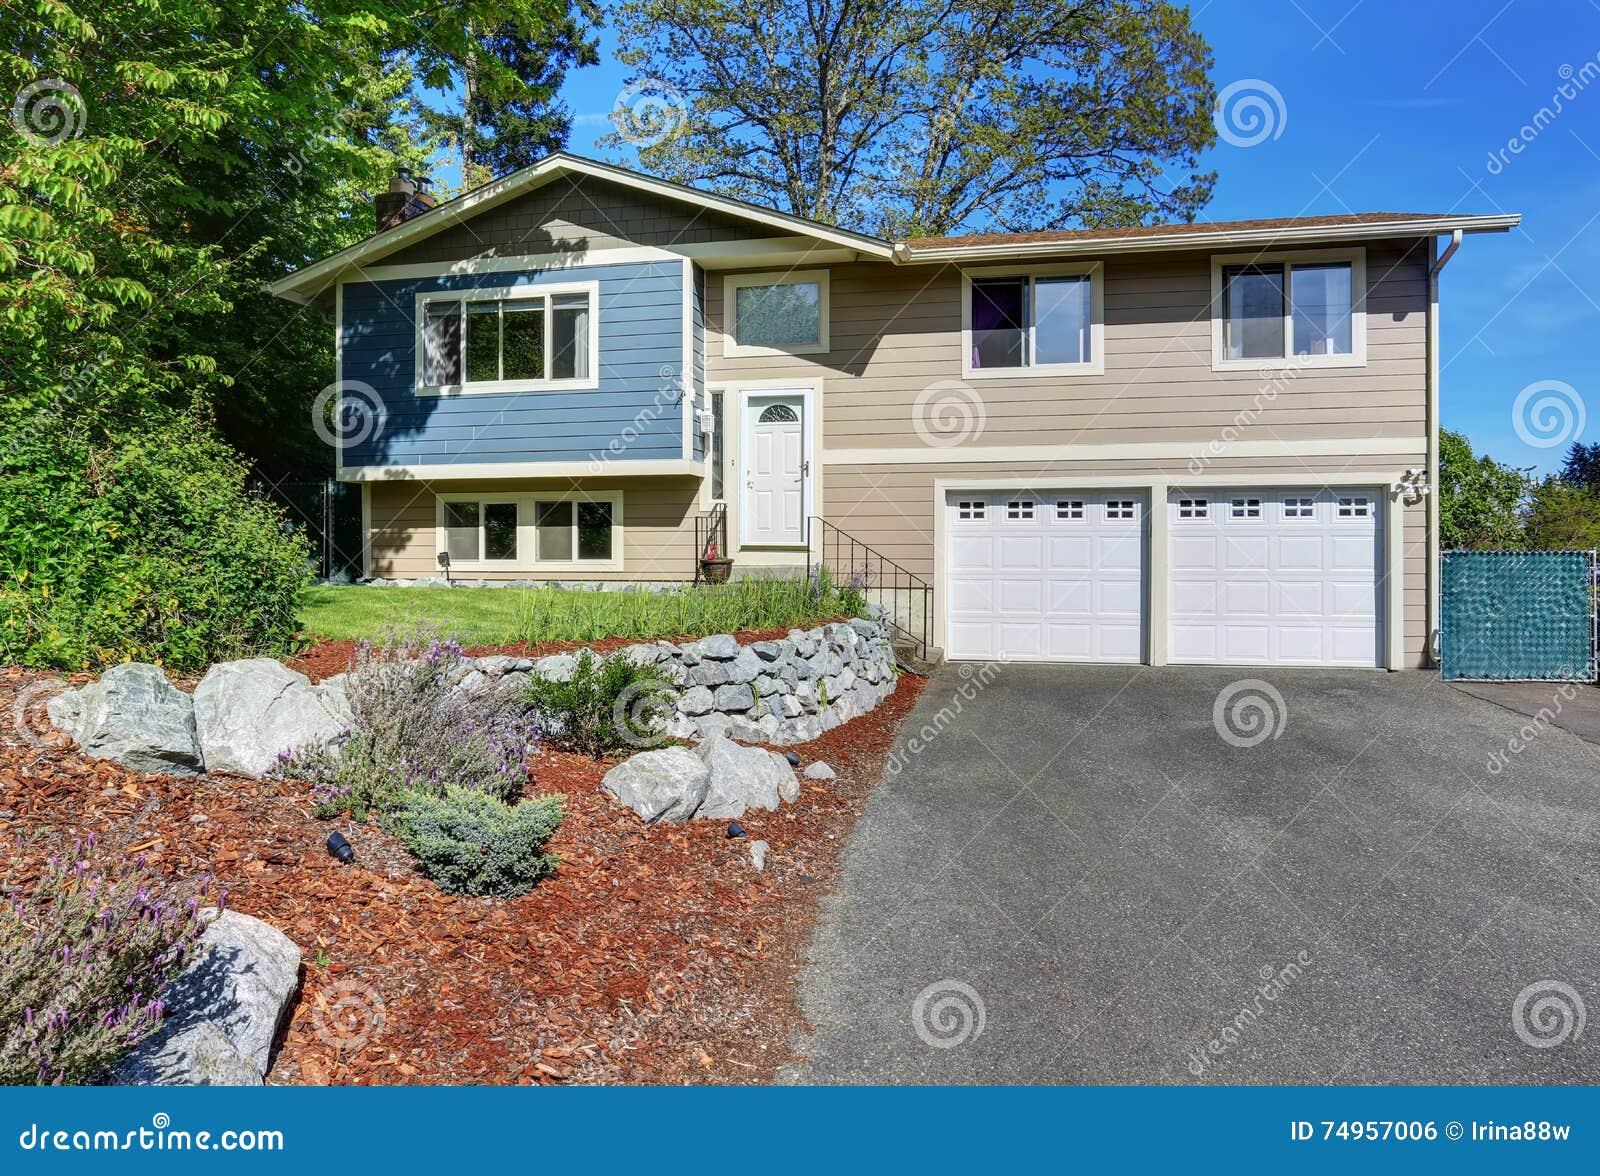 Typical facade of american house blue and beige exterior - Colori facciate esterne case ...